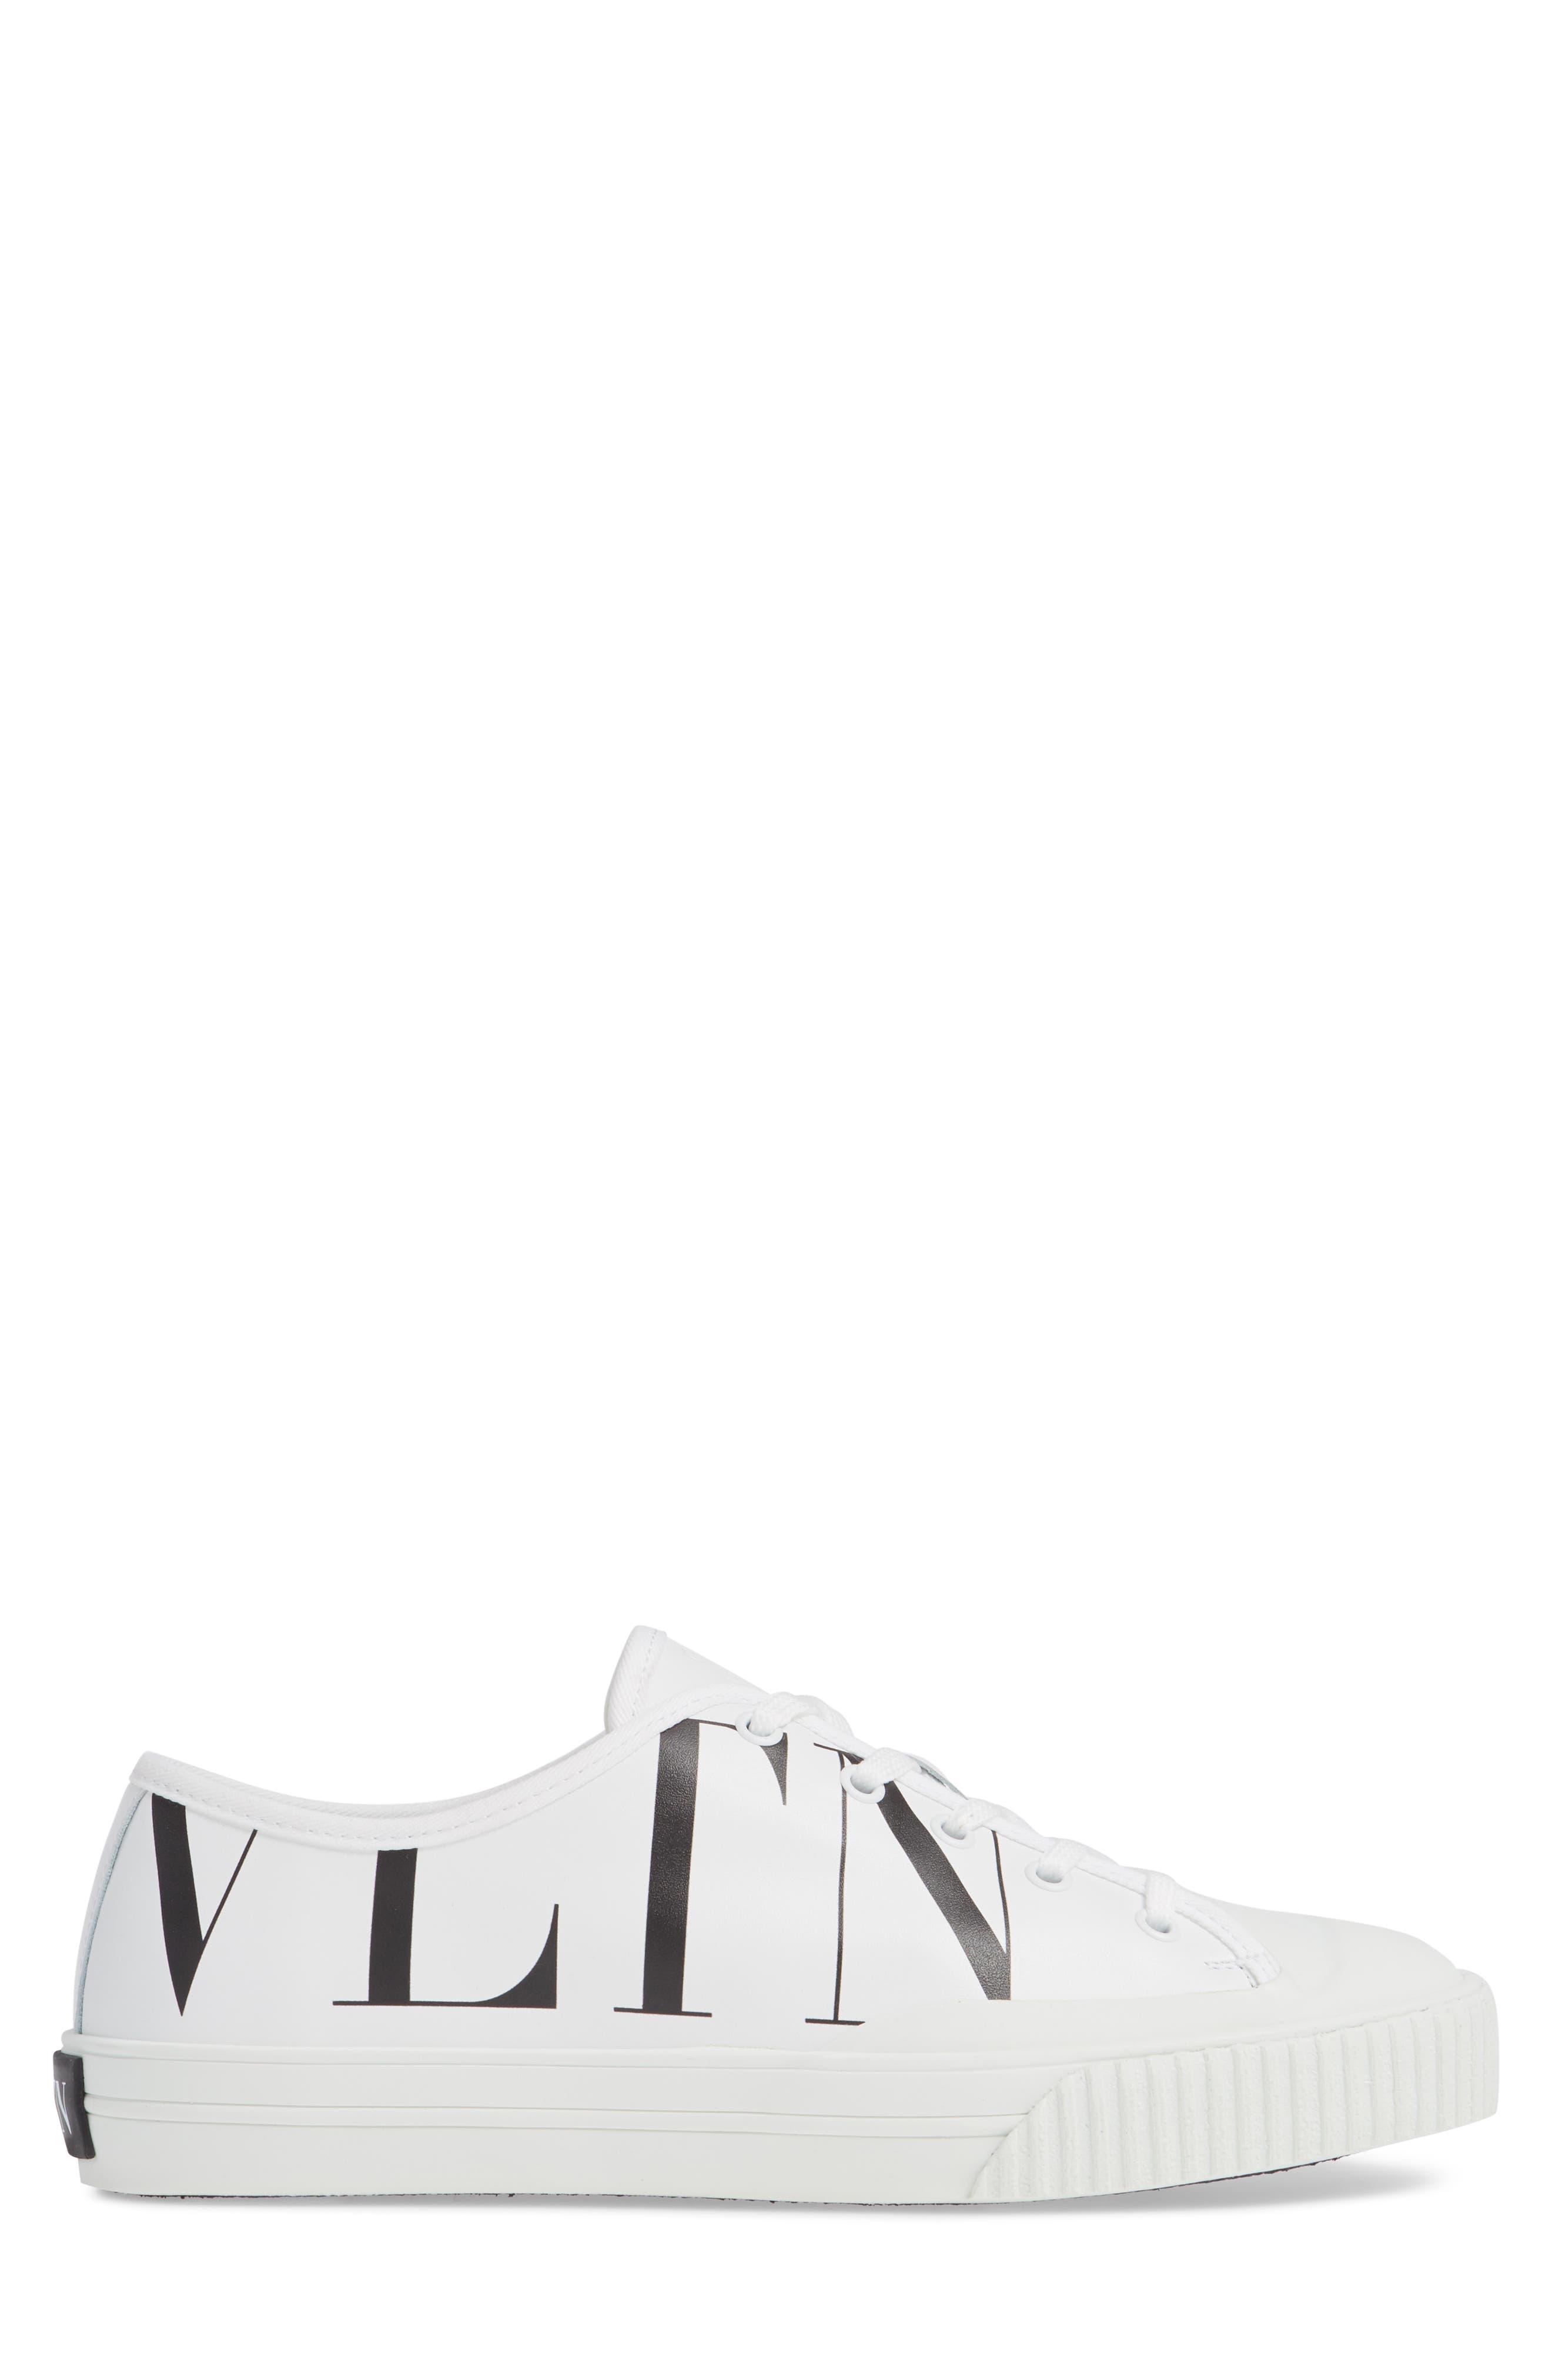 VLTN Low Top Sneaker,                             Alternate thumbnail 3, color,                             102